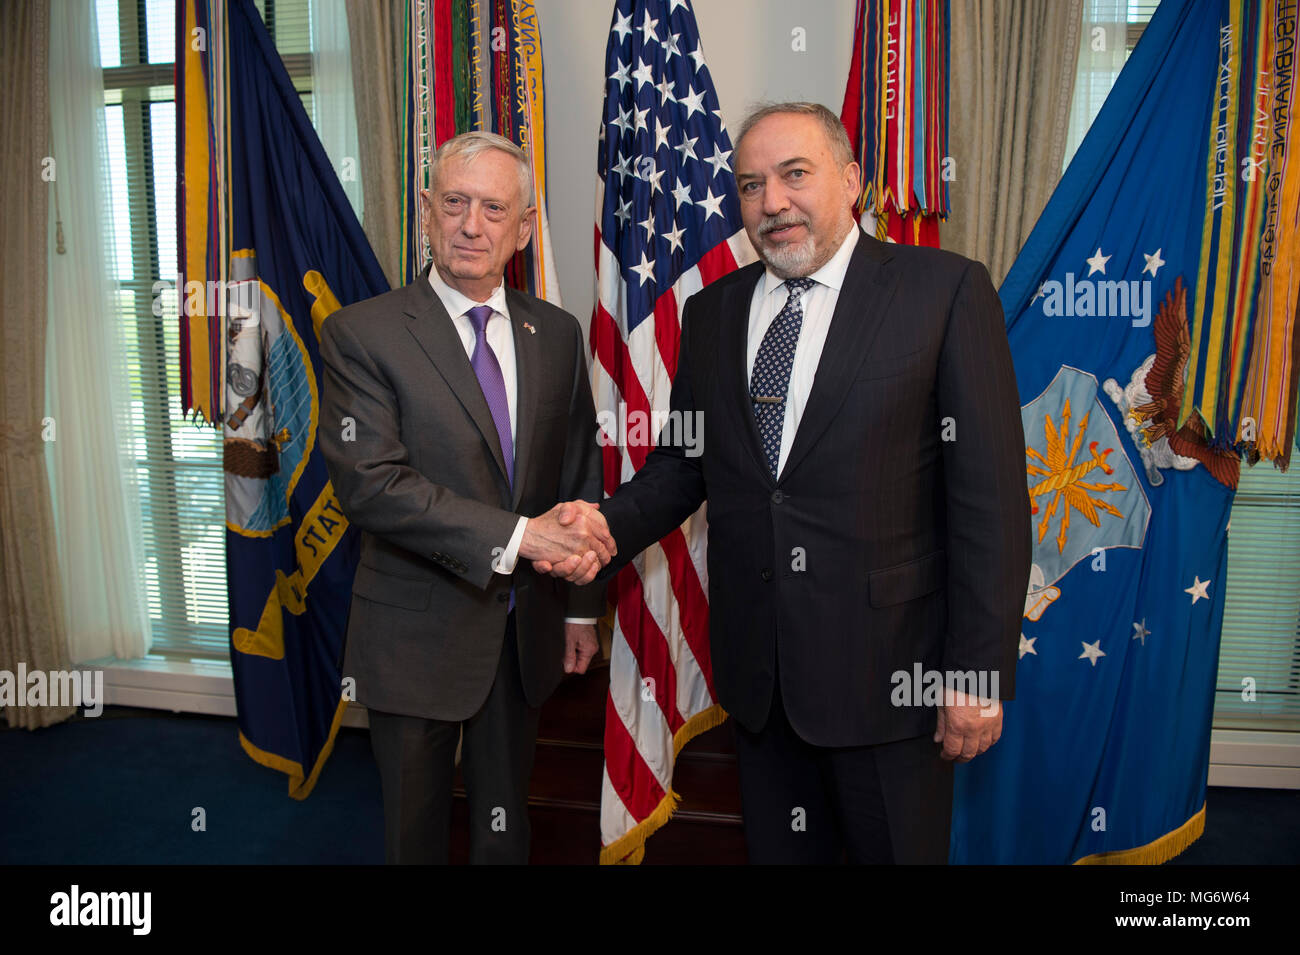 U.S. Secretary of Defense Jim Mattis welcomes Israeli Defense Minister Avigdor Lieberman, left, on arrival for a  bilateral meeting at the Pentagon April 26, 2018 in Arlington, Virginia. - Stock Image